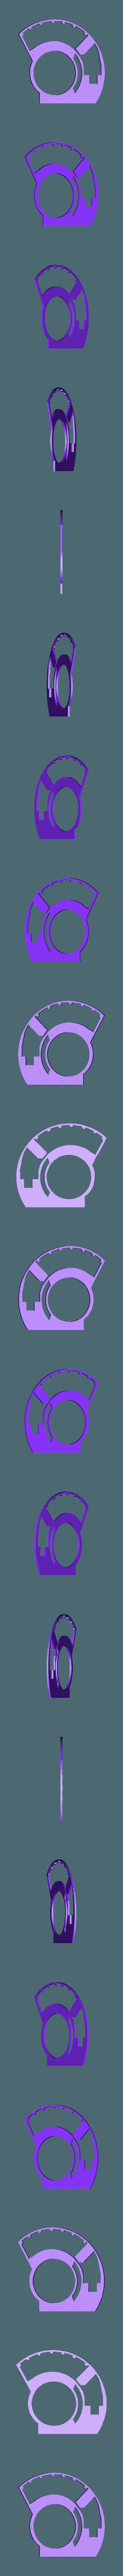 Meio.stl Download free STL file Teclado Gamer • Model to 3D print, CircuitoMaker